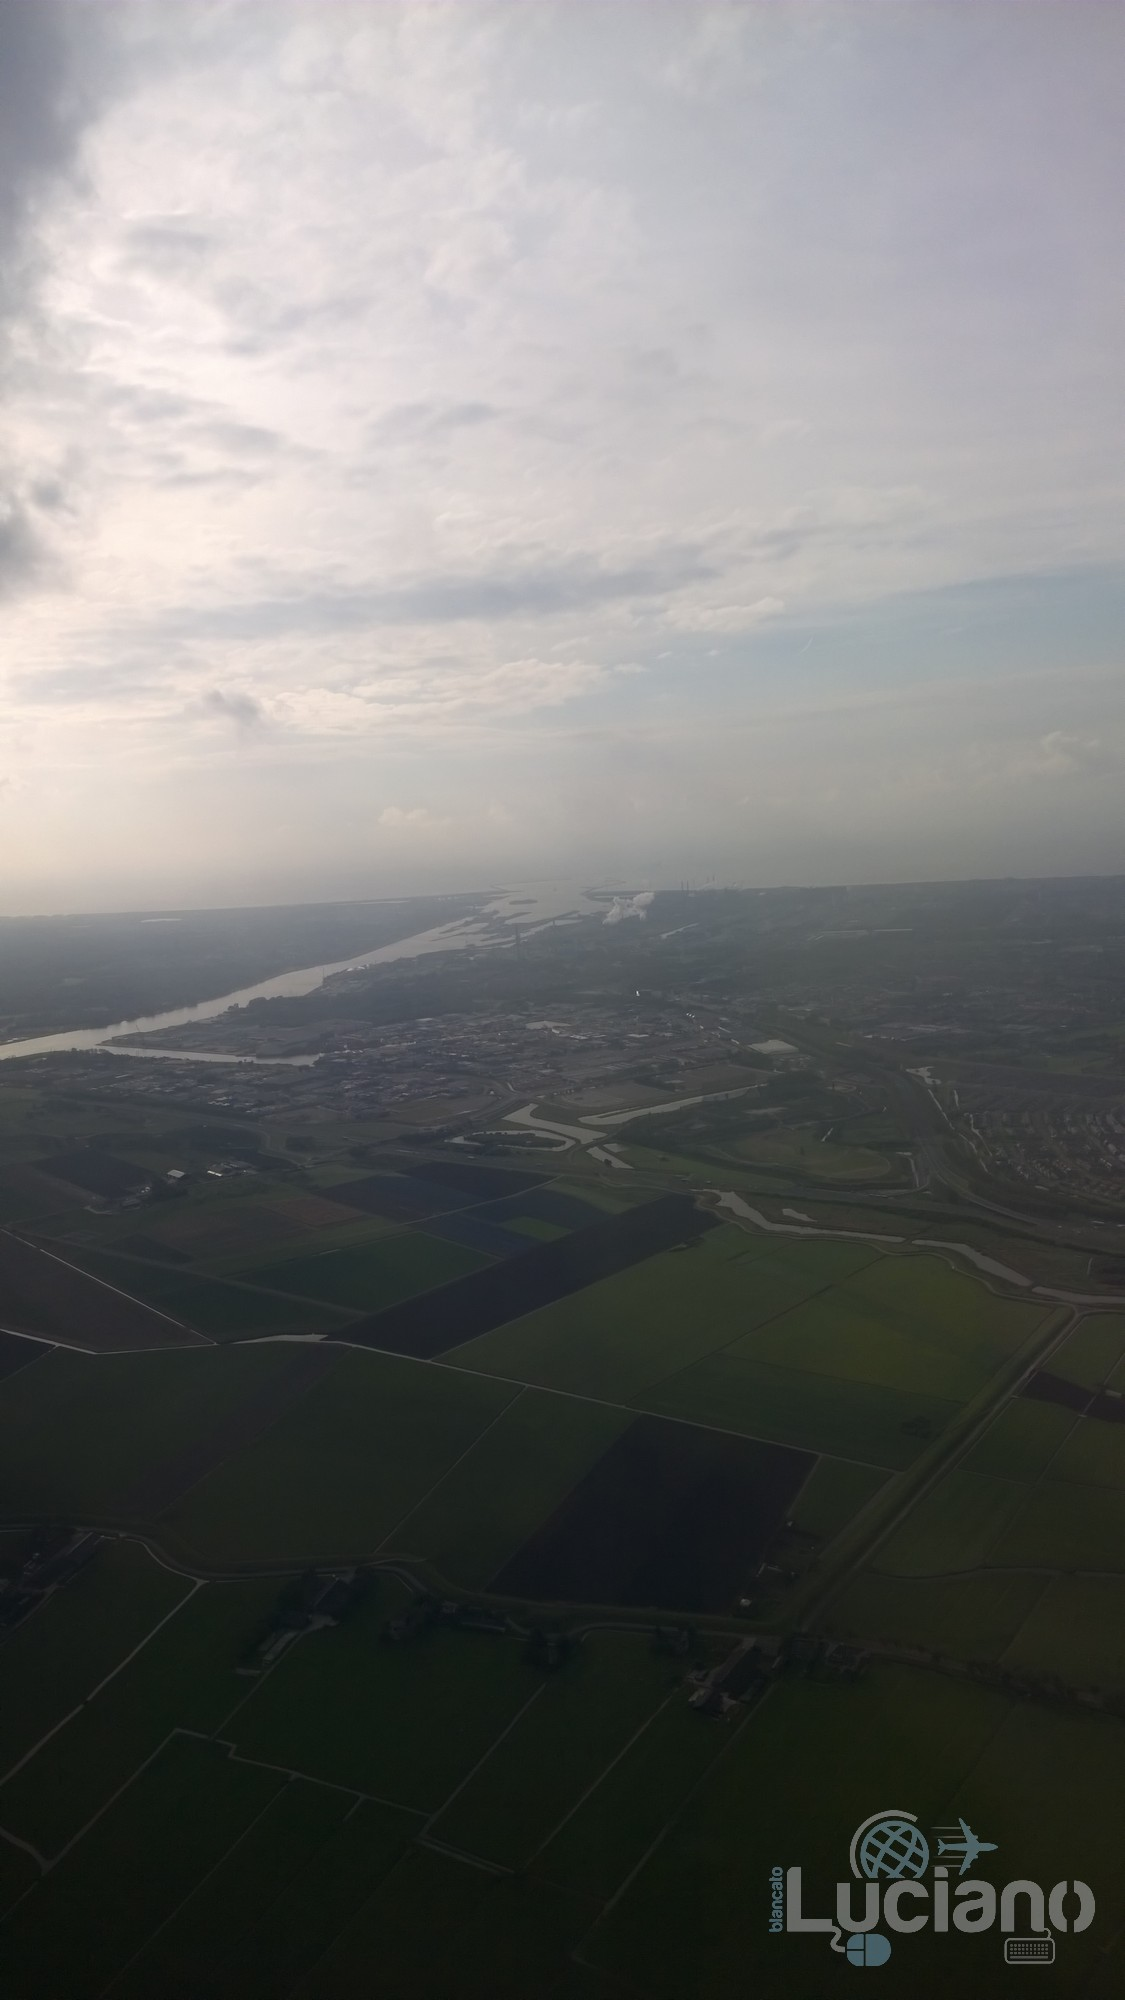 amsterdam-2014-vueling-lucianoblancatoit (13)